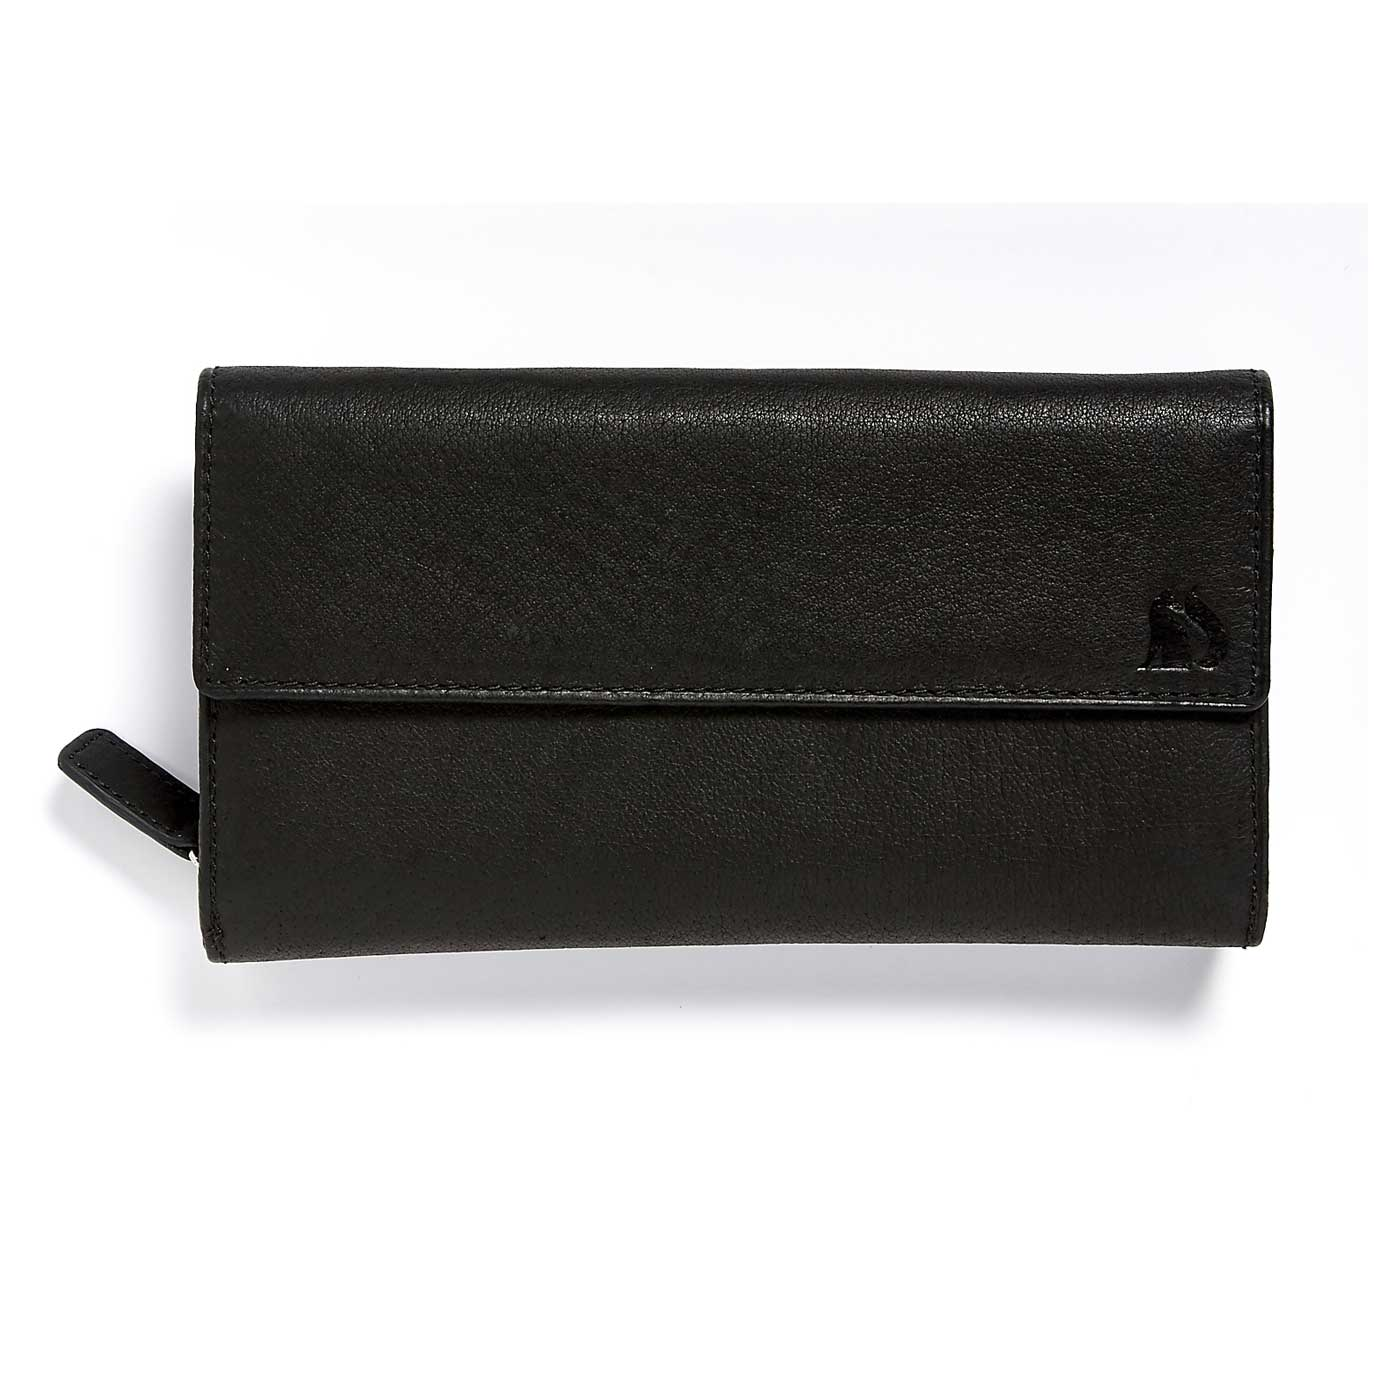 grizedale-foxfield-black-leather-purse